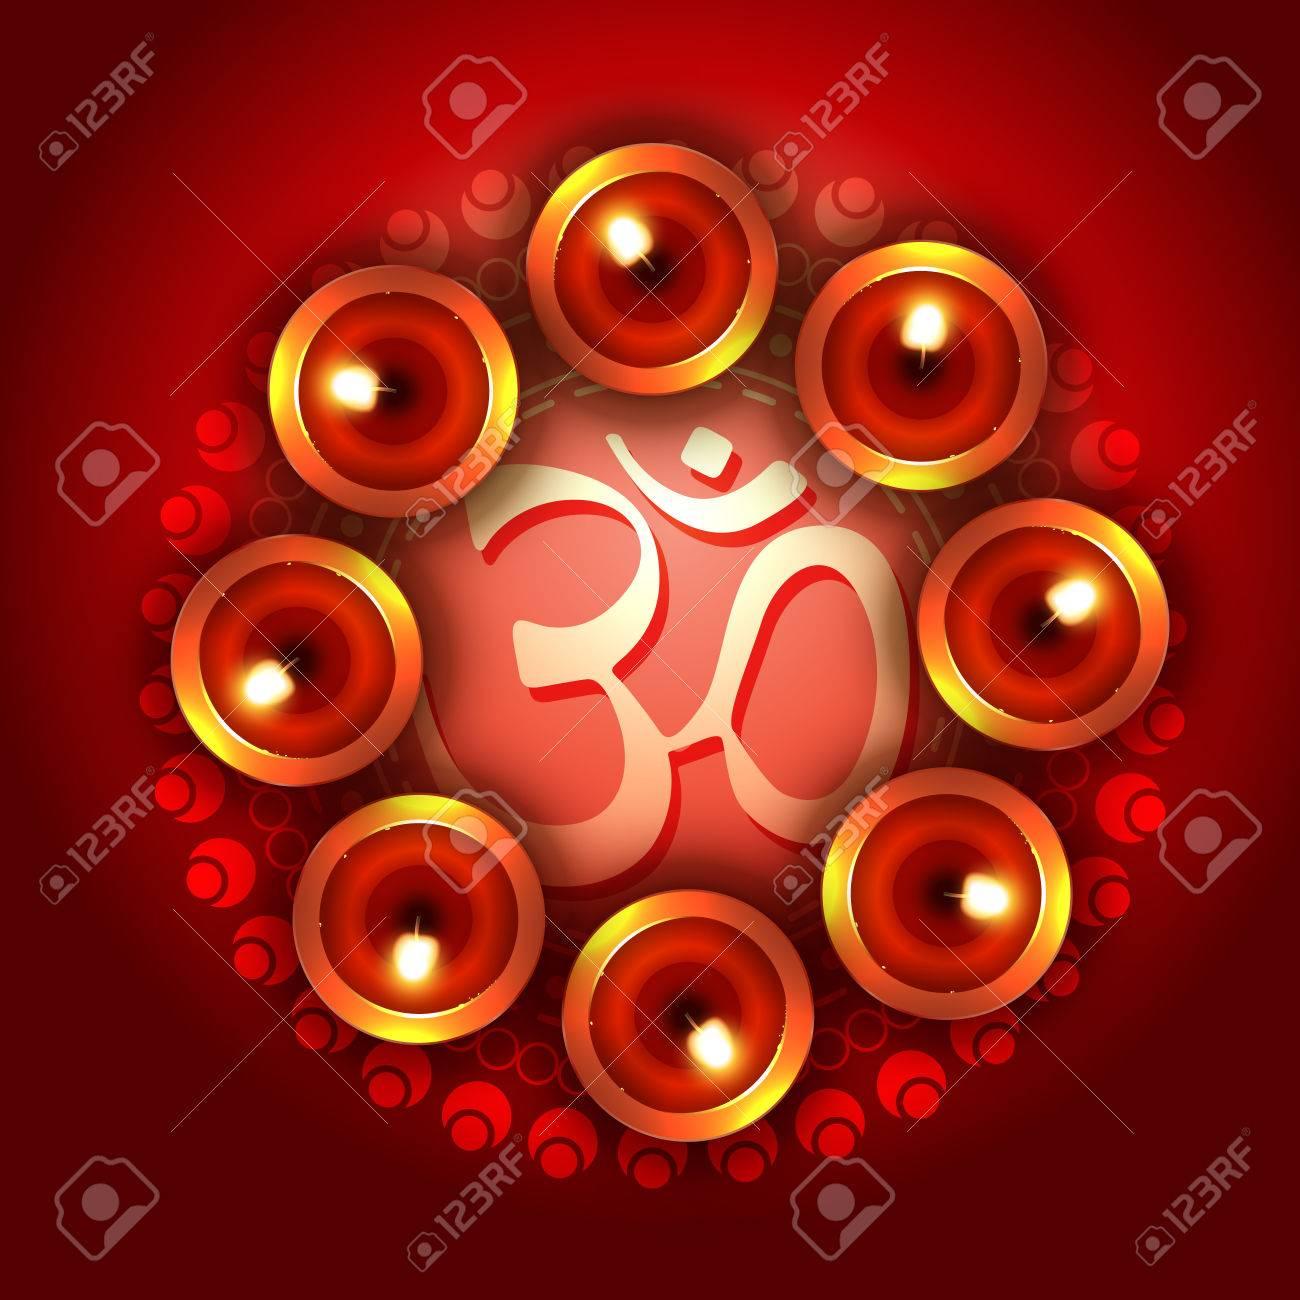 diwali background with diya and om symbol Stock Vector - 22464008